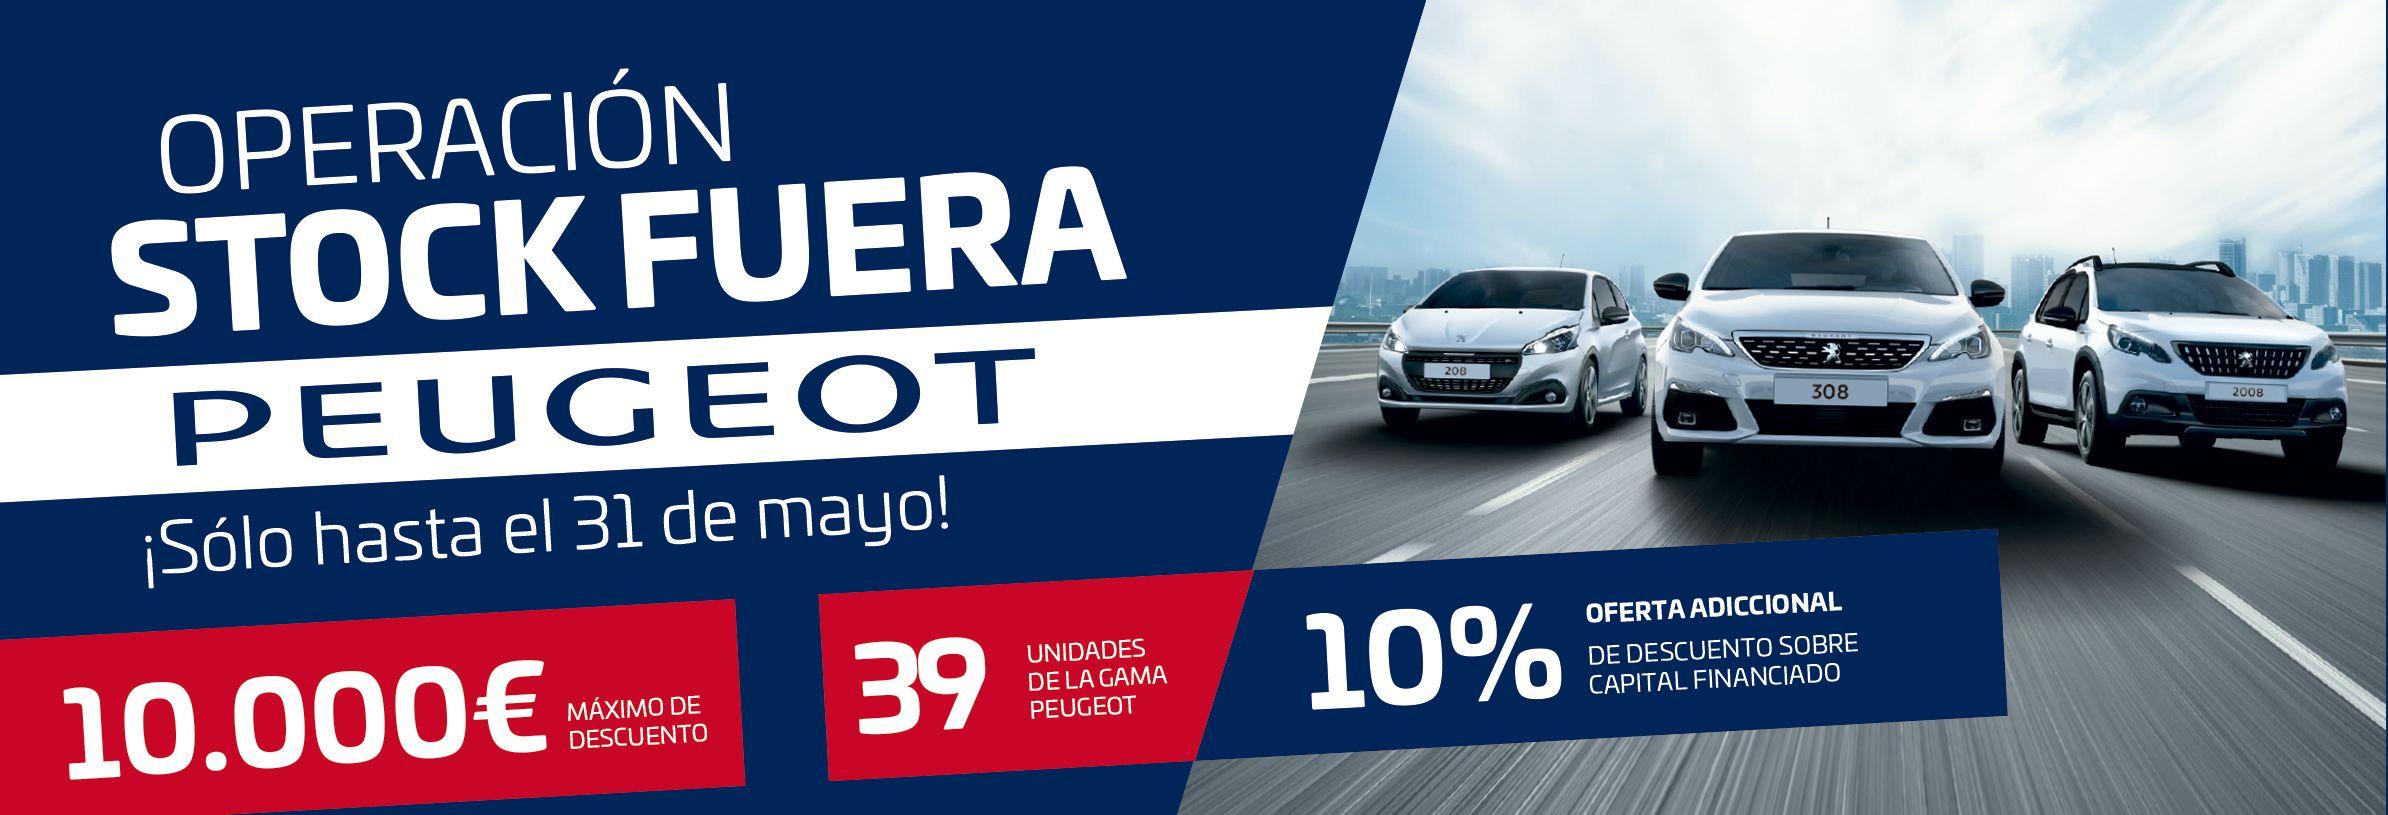 Operacion Stock Fuera en Peugeot Tumosa